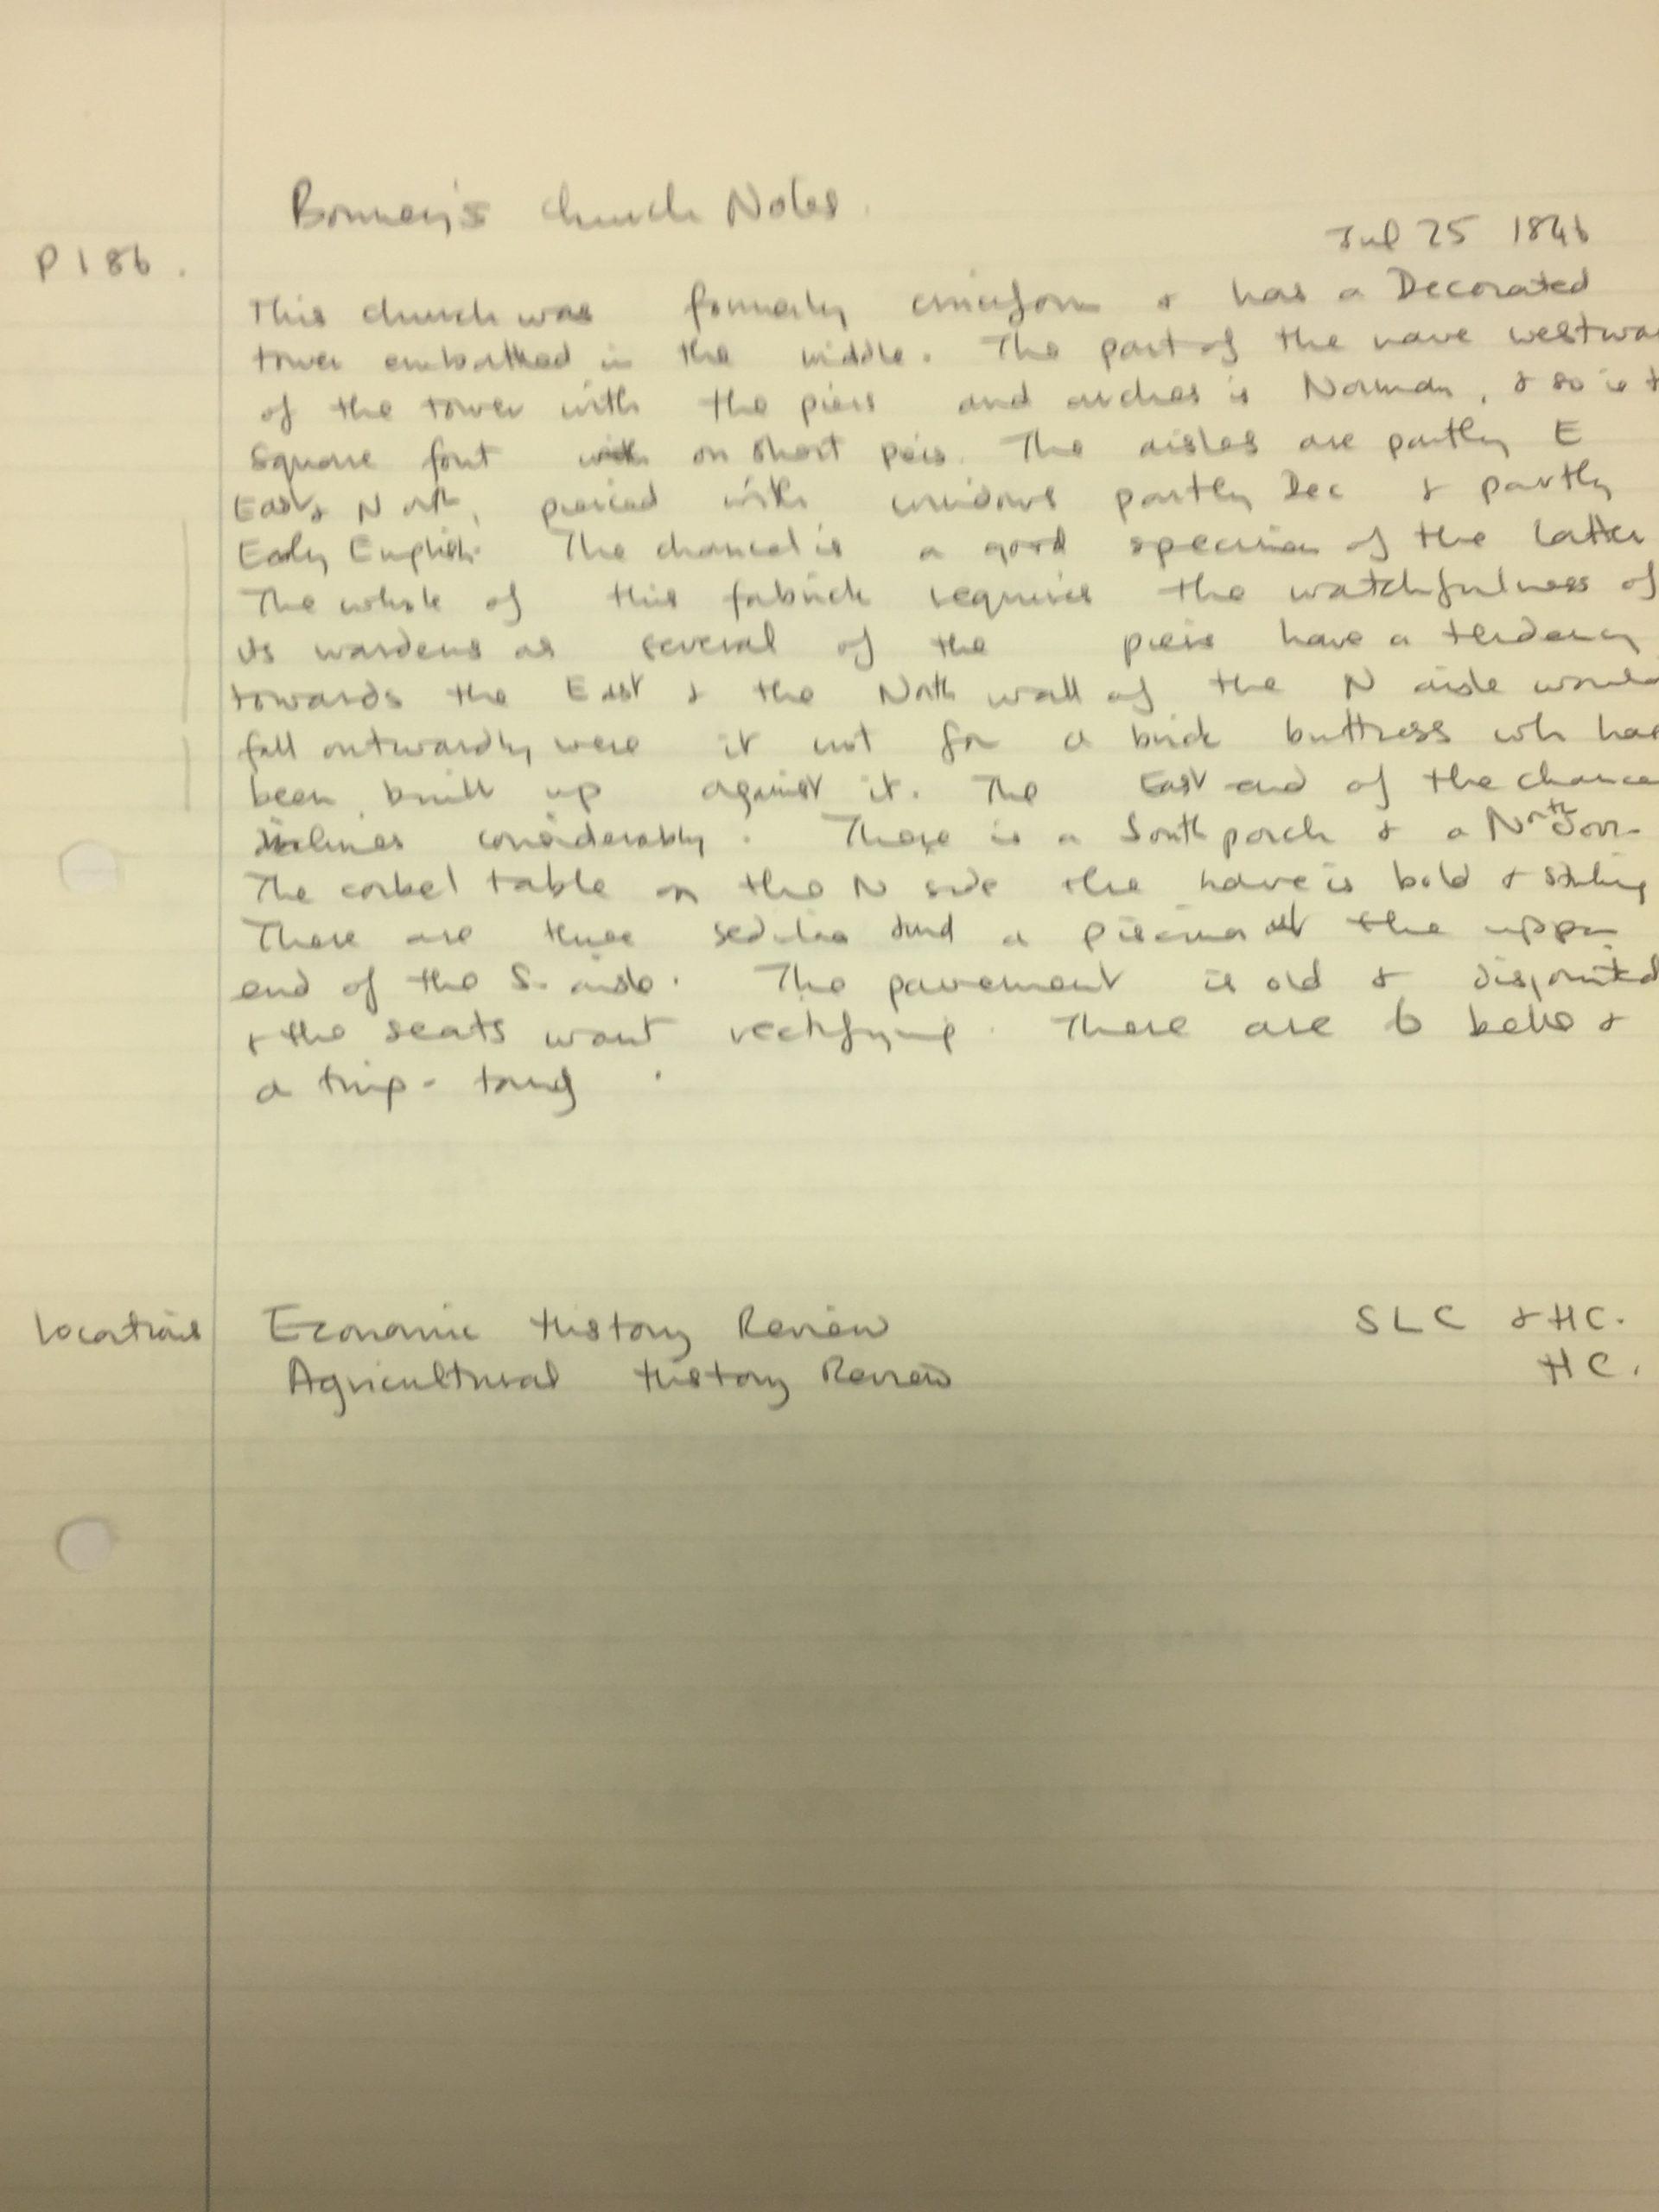 HH STSW 1846 Bonney's church notes